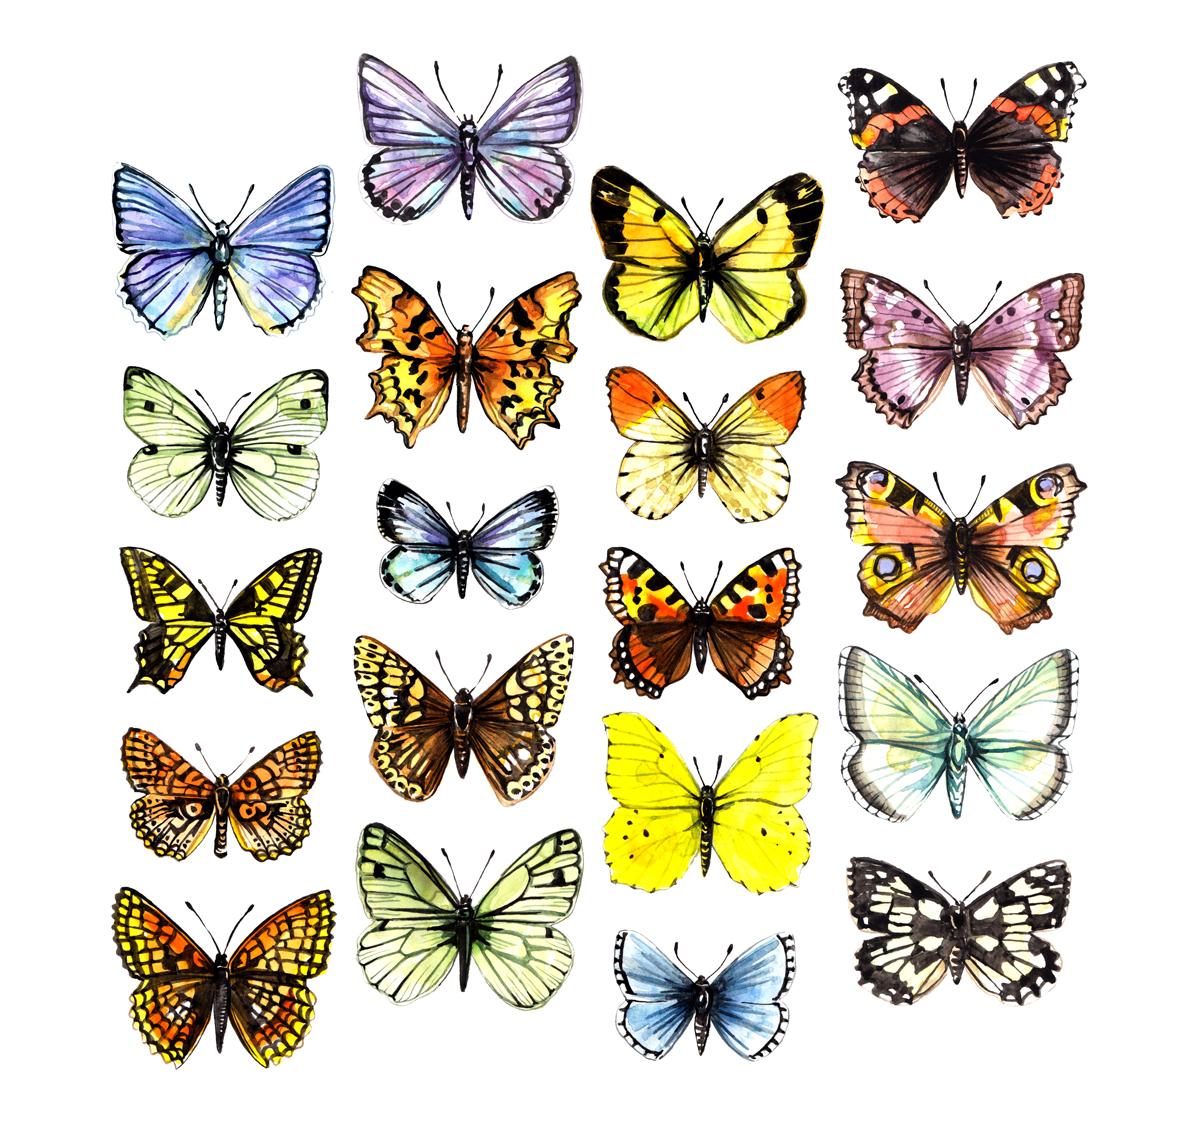 Watercolour illustration - butterflies